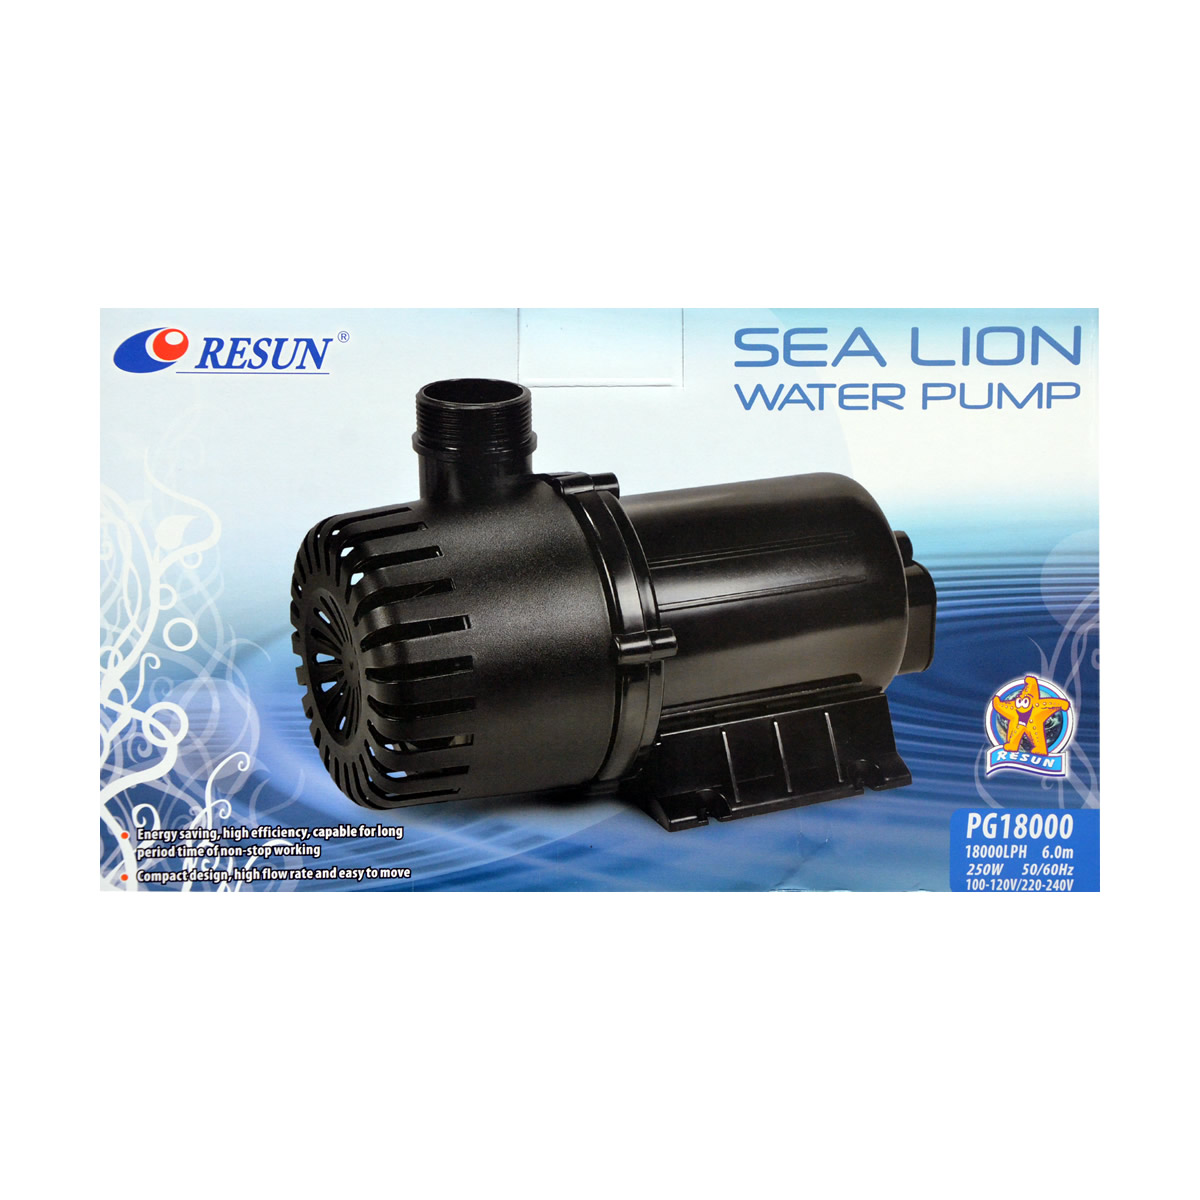 ReSun PG18000 Sea Lion Pond Circulation Water Pump 250W 18000L/H